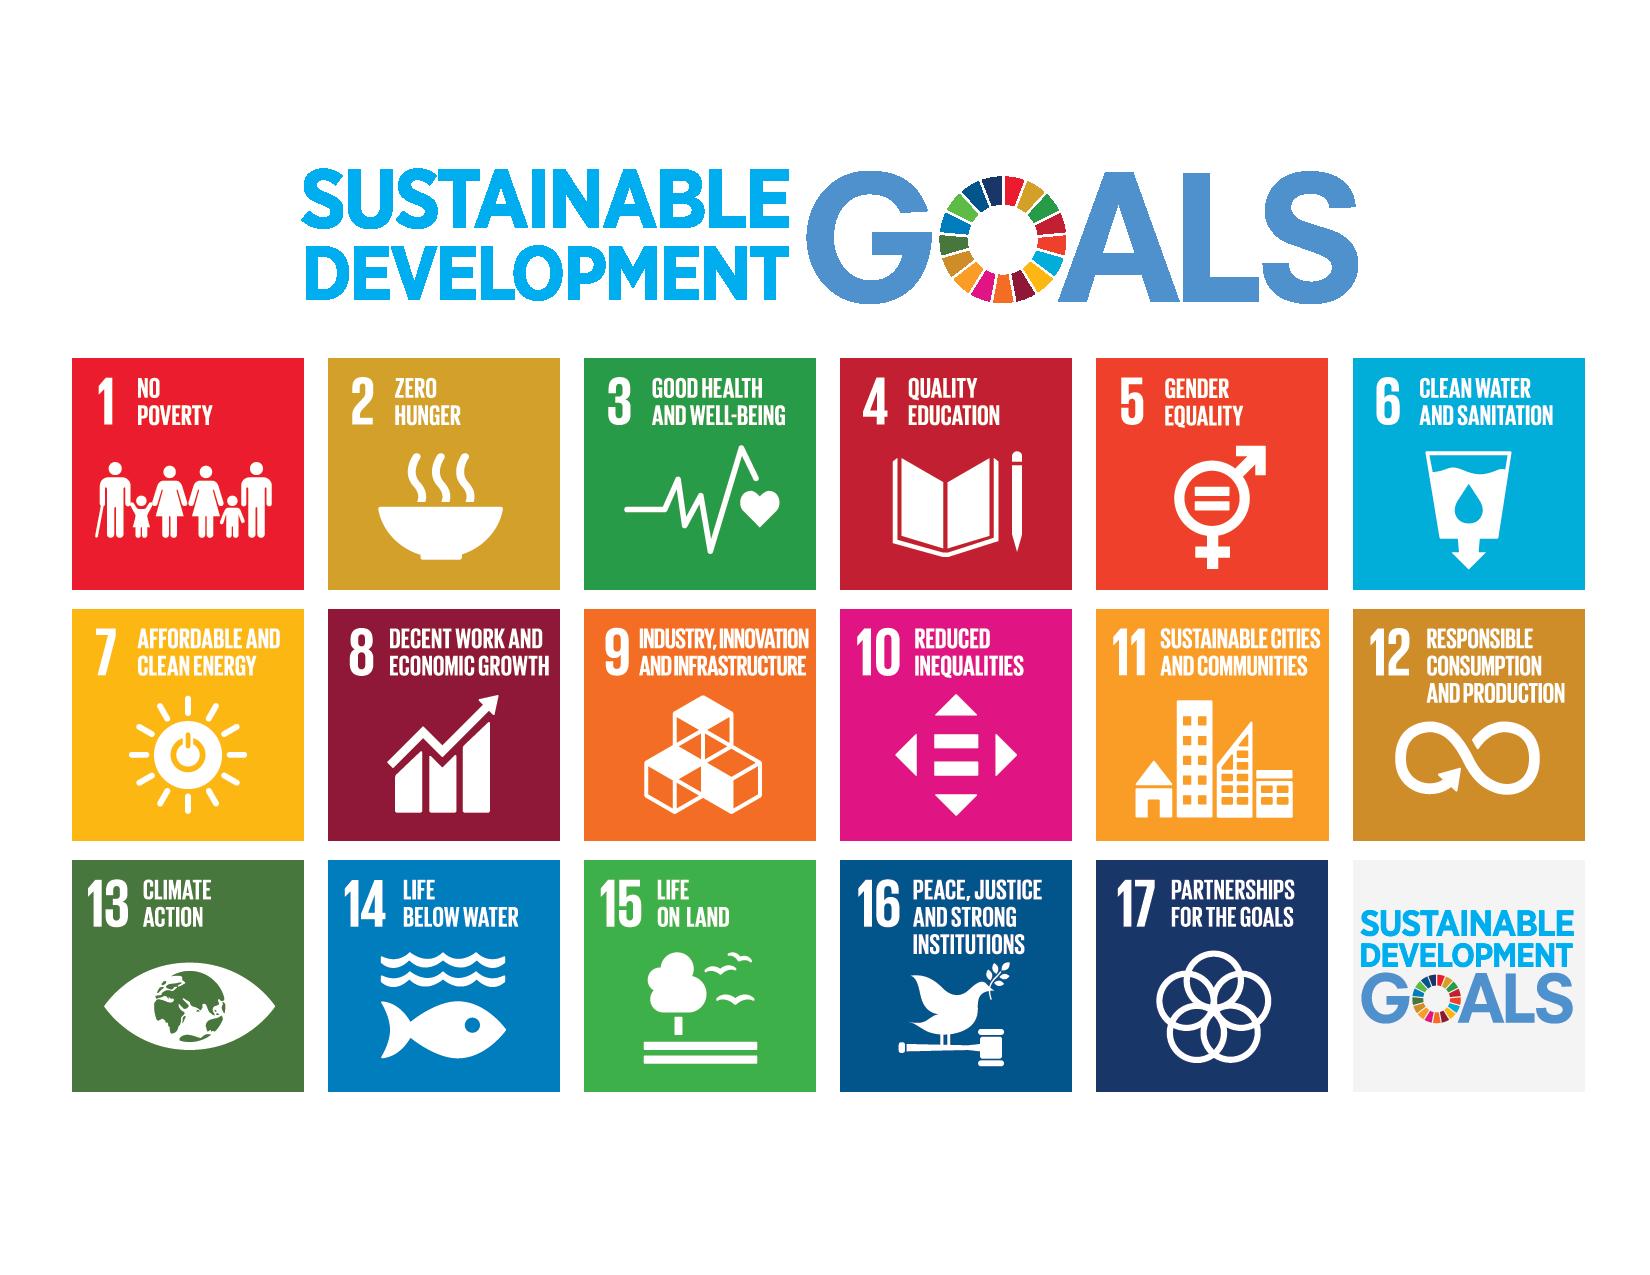 The UN Sustainable Development Goals (SDGs)